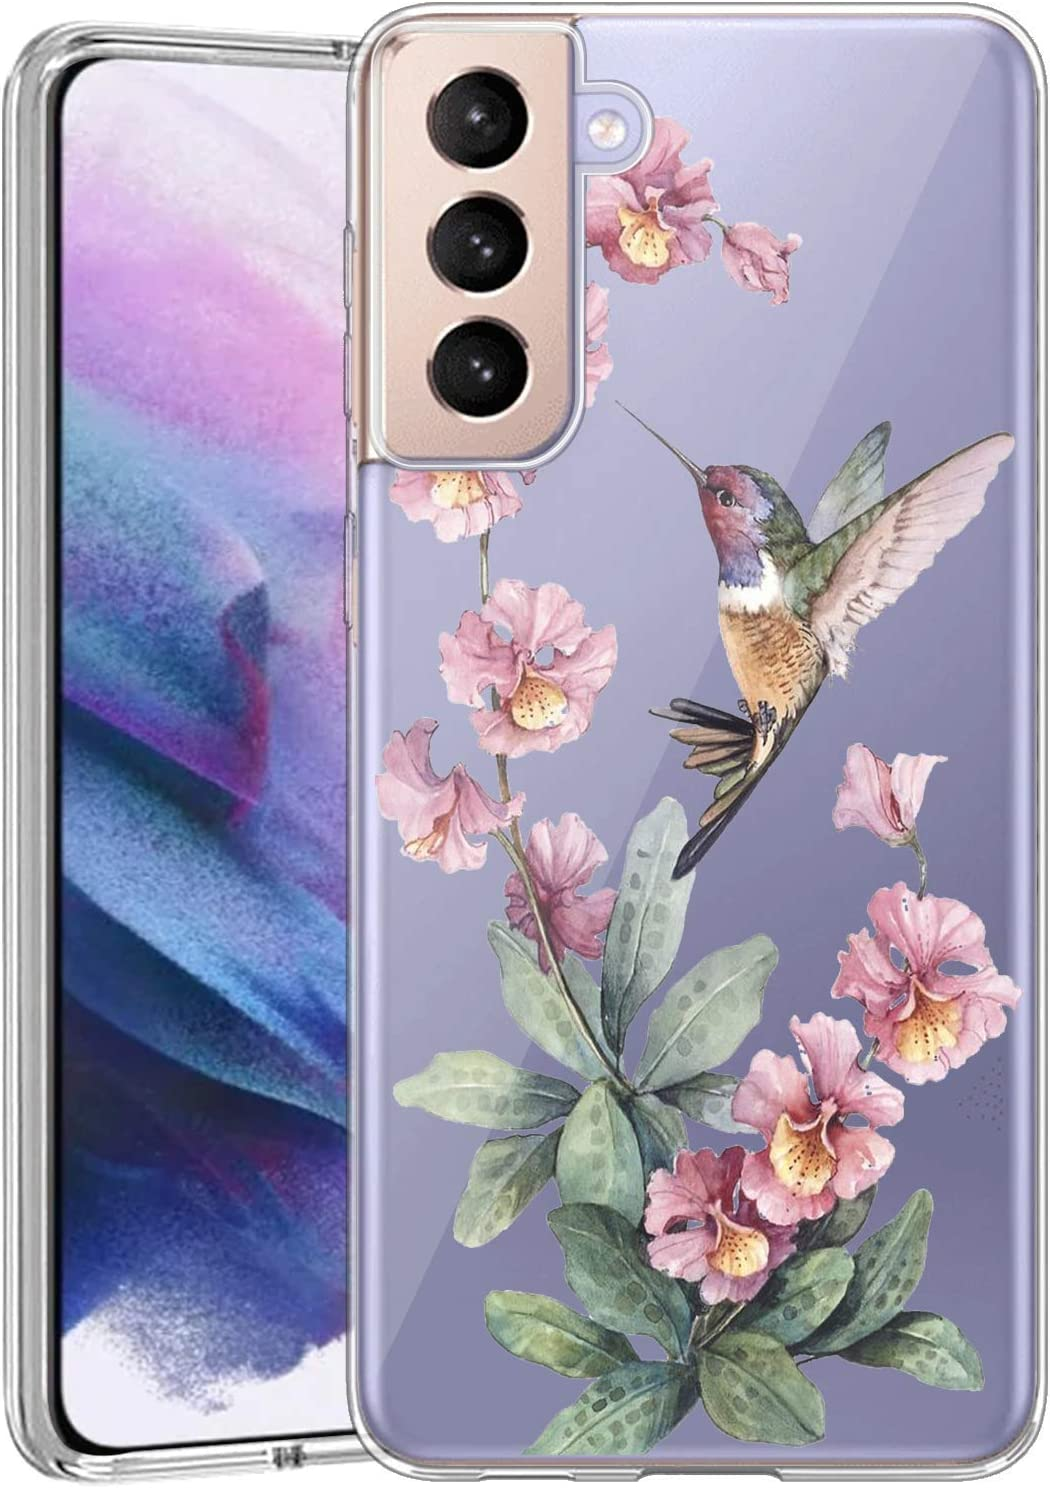 Case for Samsung Galaxy S21 5G Clear Phone Case Customized Hummingbird for Girls Women Transparent Anti-Scratch Shockproof Slim Flexible TPU Bumper Protective Cover Case for Samsung Galaxy S21 5G